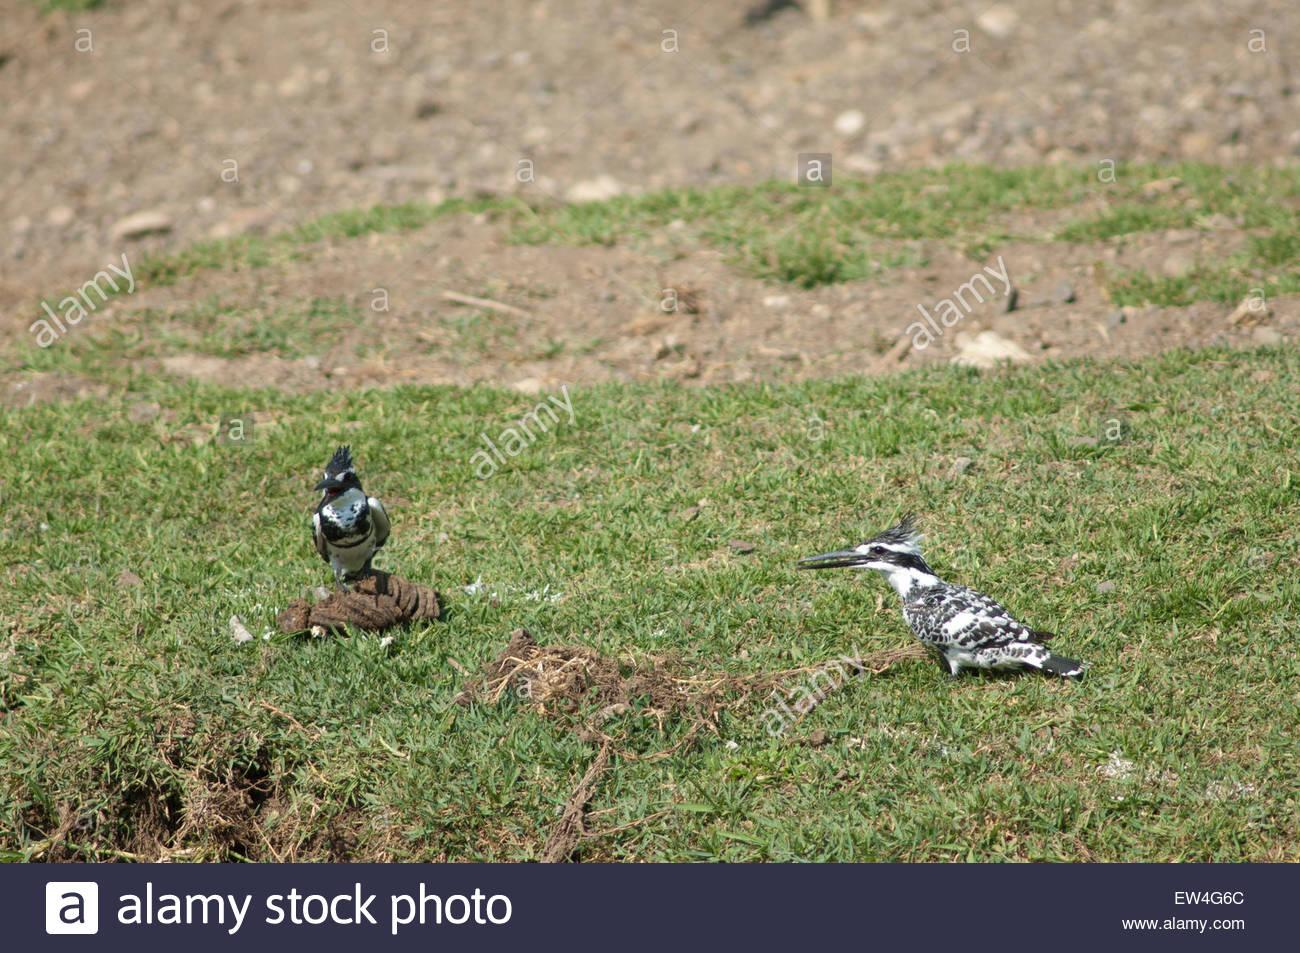 Pied kingfishers (Ceryle rudis) calling. Hiran river. Gir Lion Sanctuary and National Park. Gujarat. India. - Stock Image